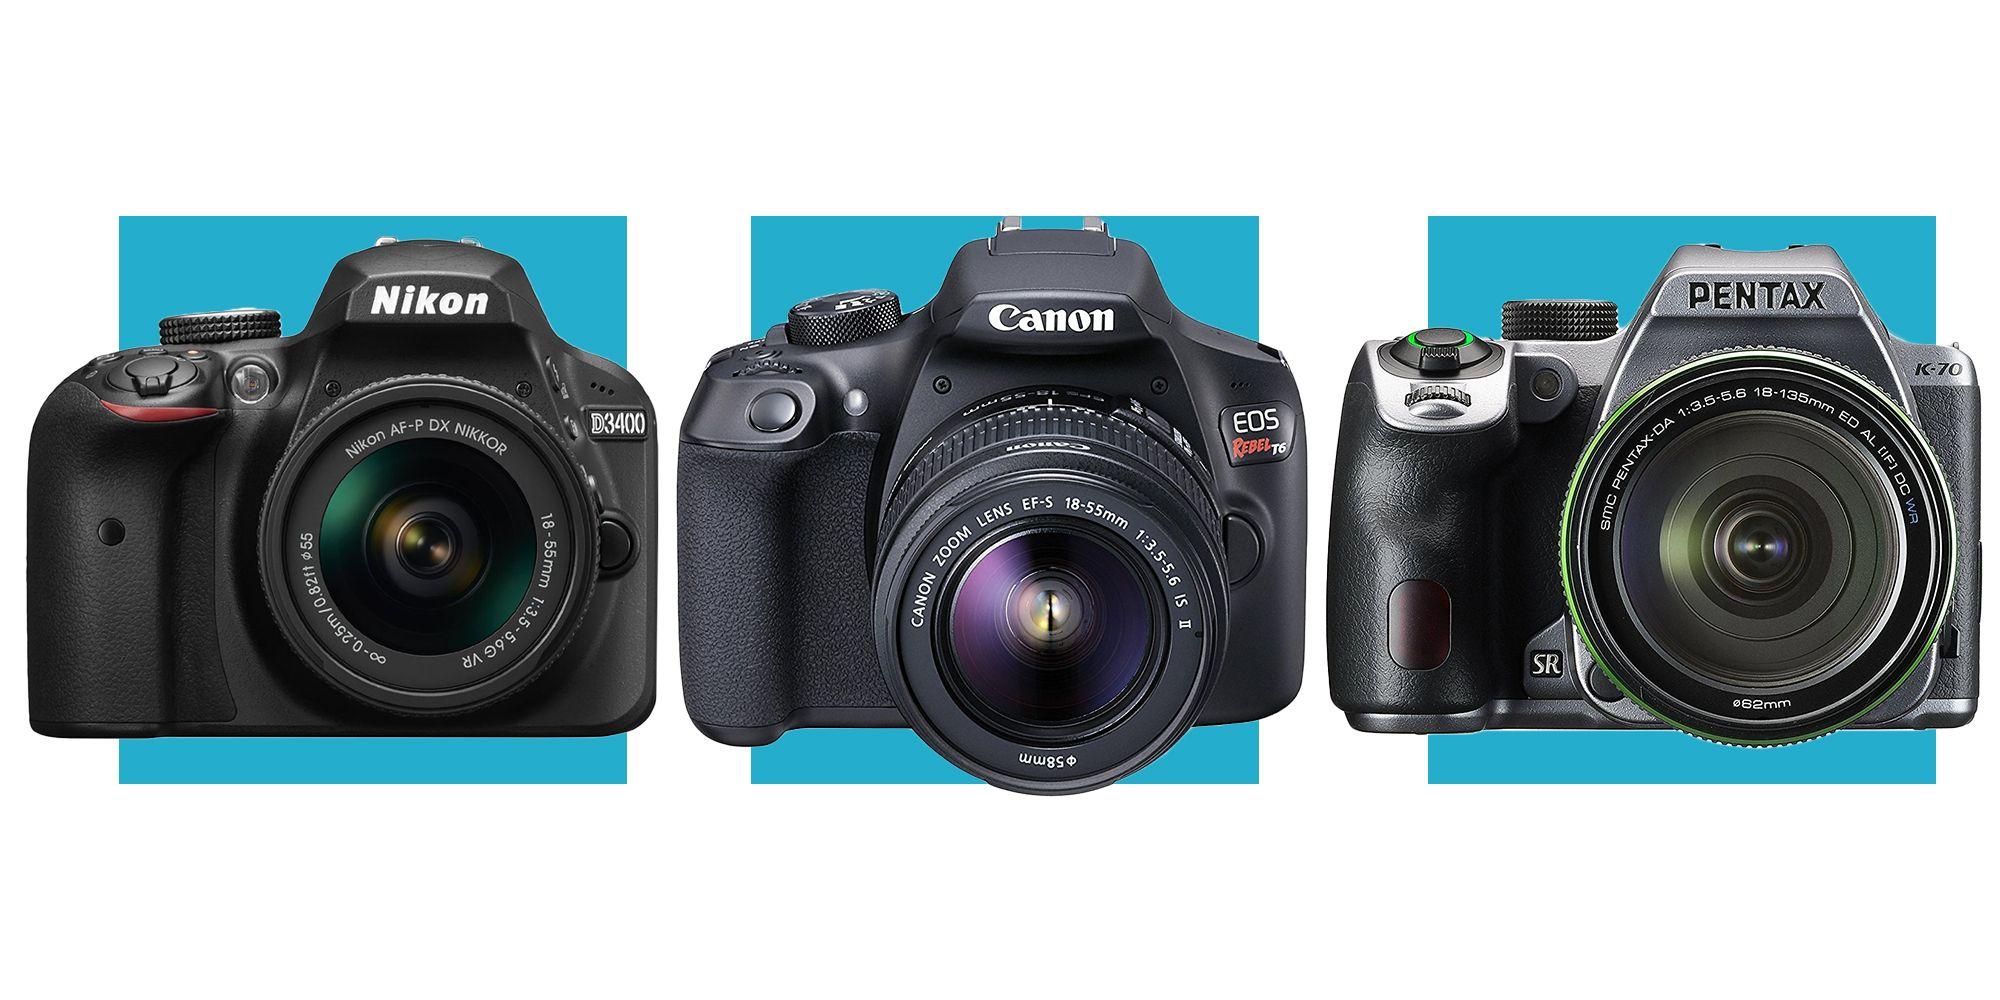 7 Best Cheap Dslr Cameras 2018 Digital Slr Under 1000 Camera Lens Parts Diagram Nikon Related Keywords